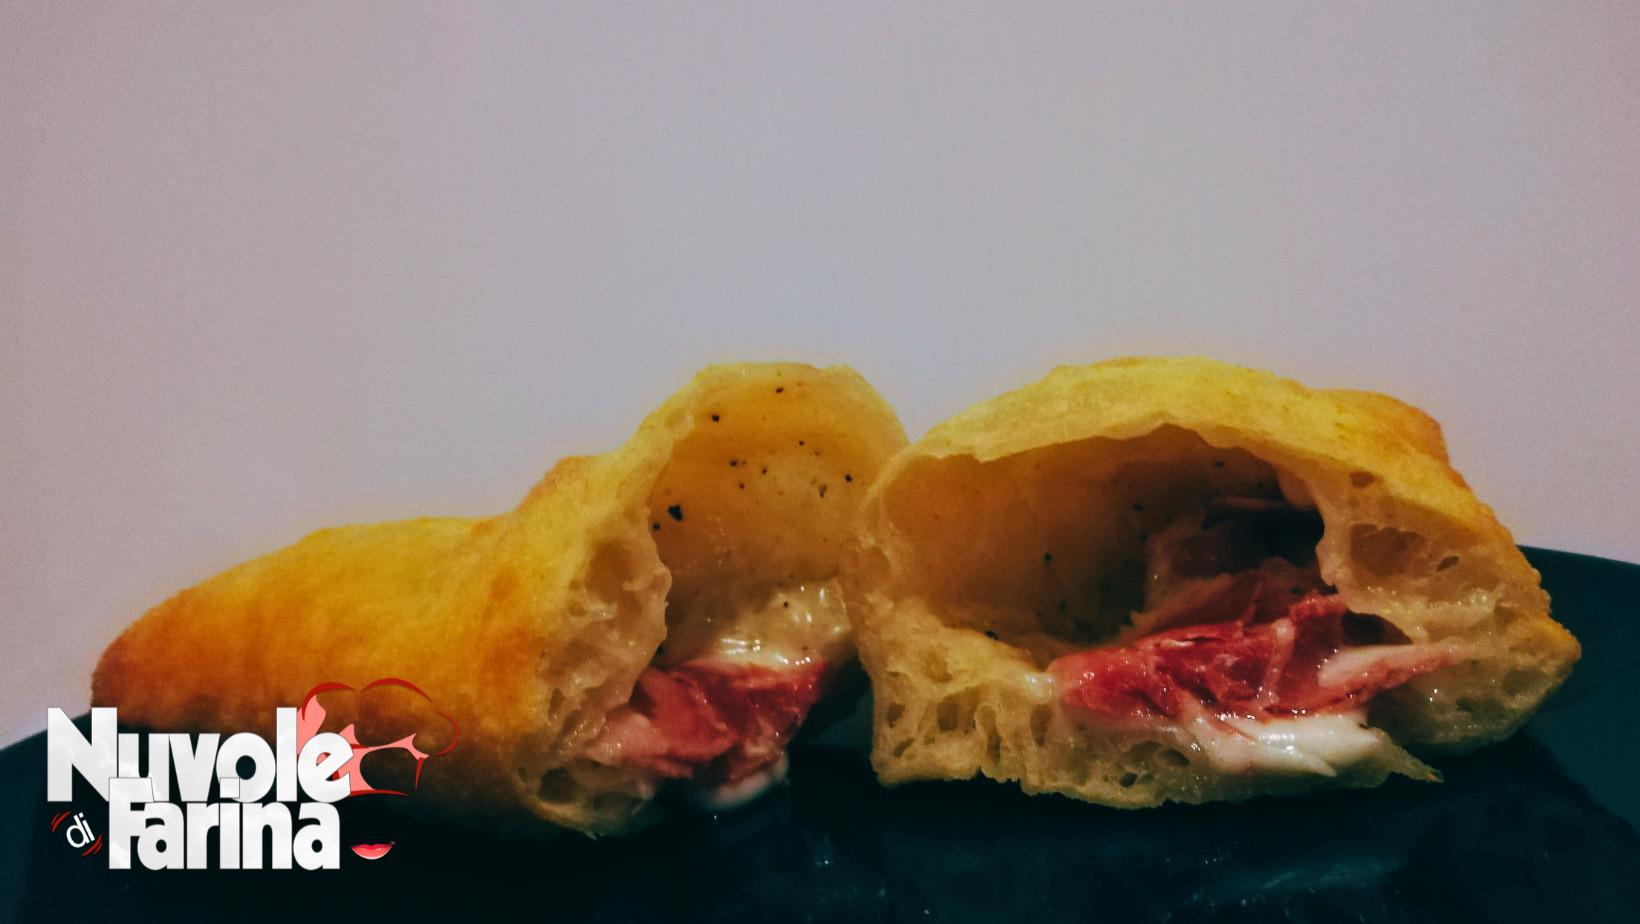 calzoni fritti cover